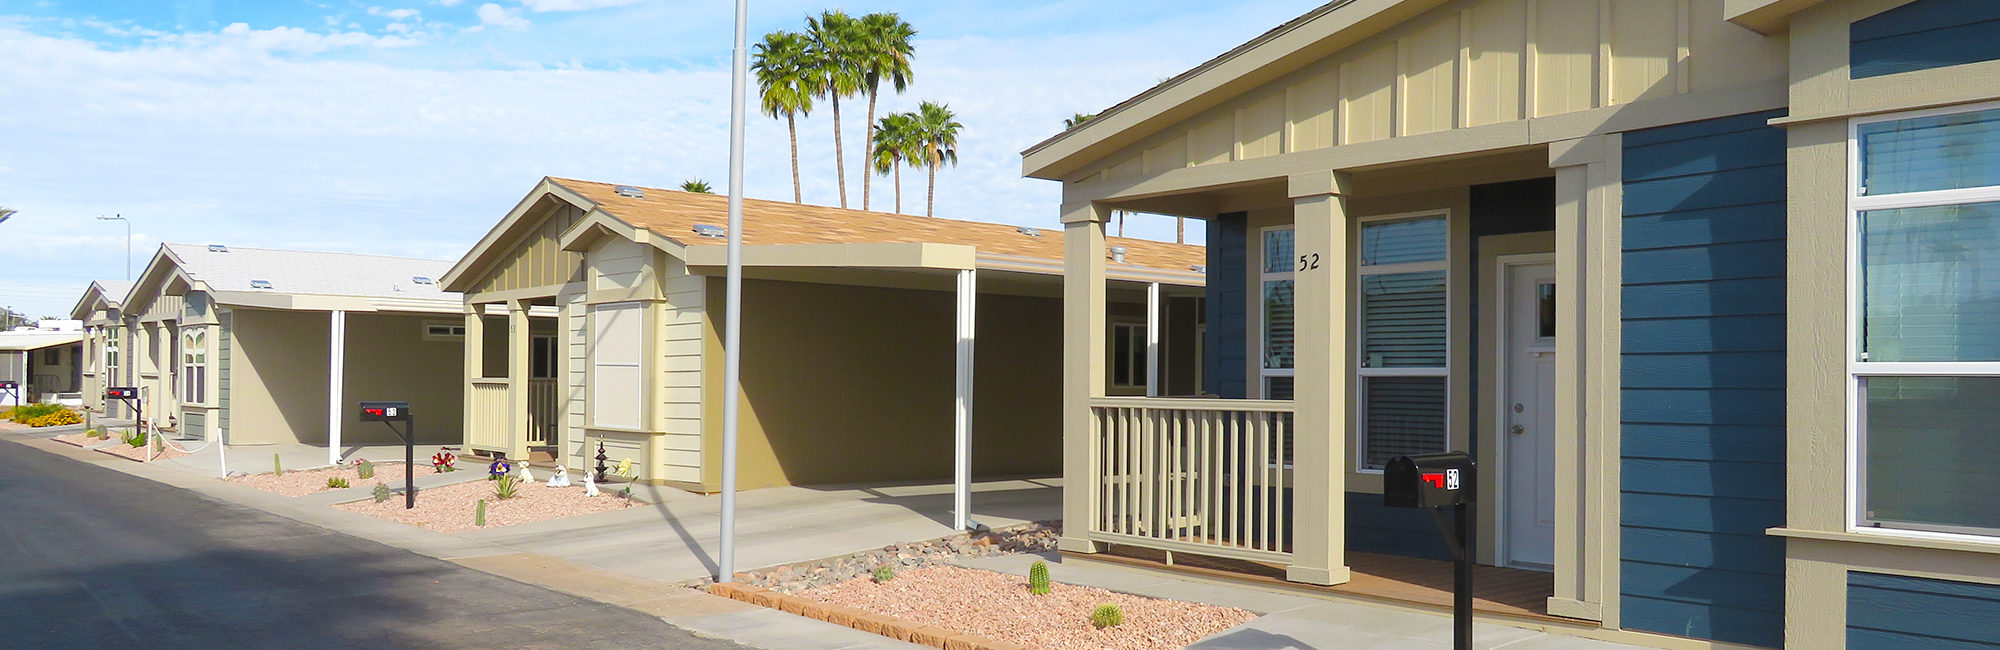 Mesa Arizona Manufactured Housing